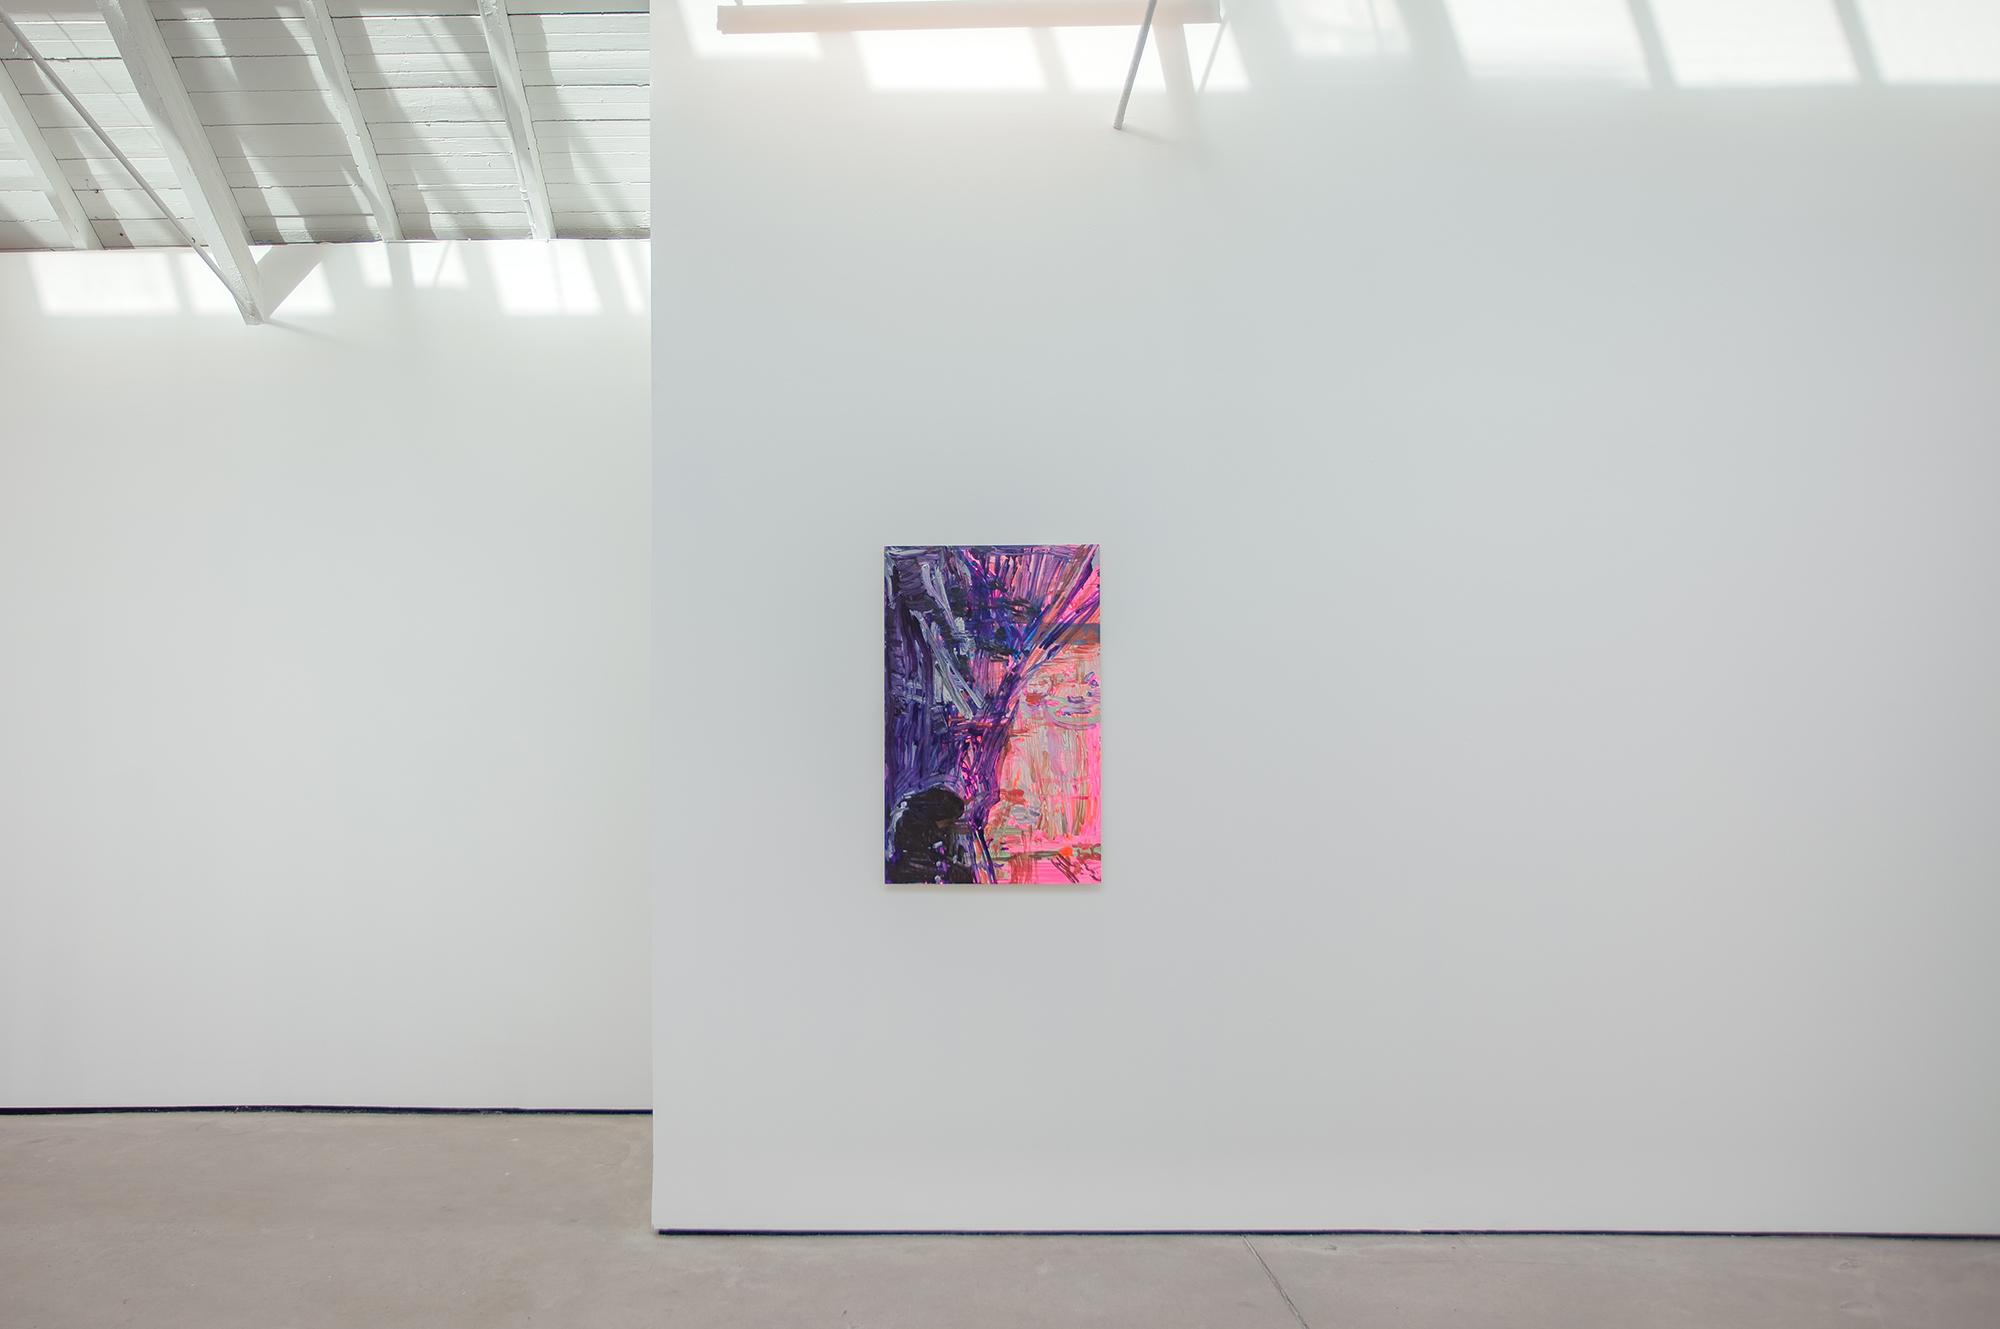 Installation view 'After a Long Sleep, It Woke Up', The Modern Institute, Osborne Street, Glasgow, 2020